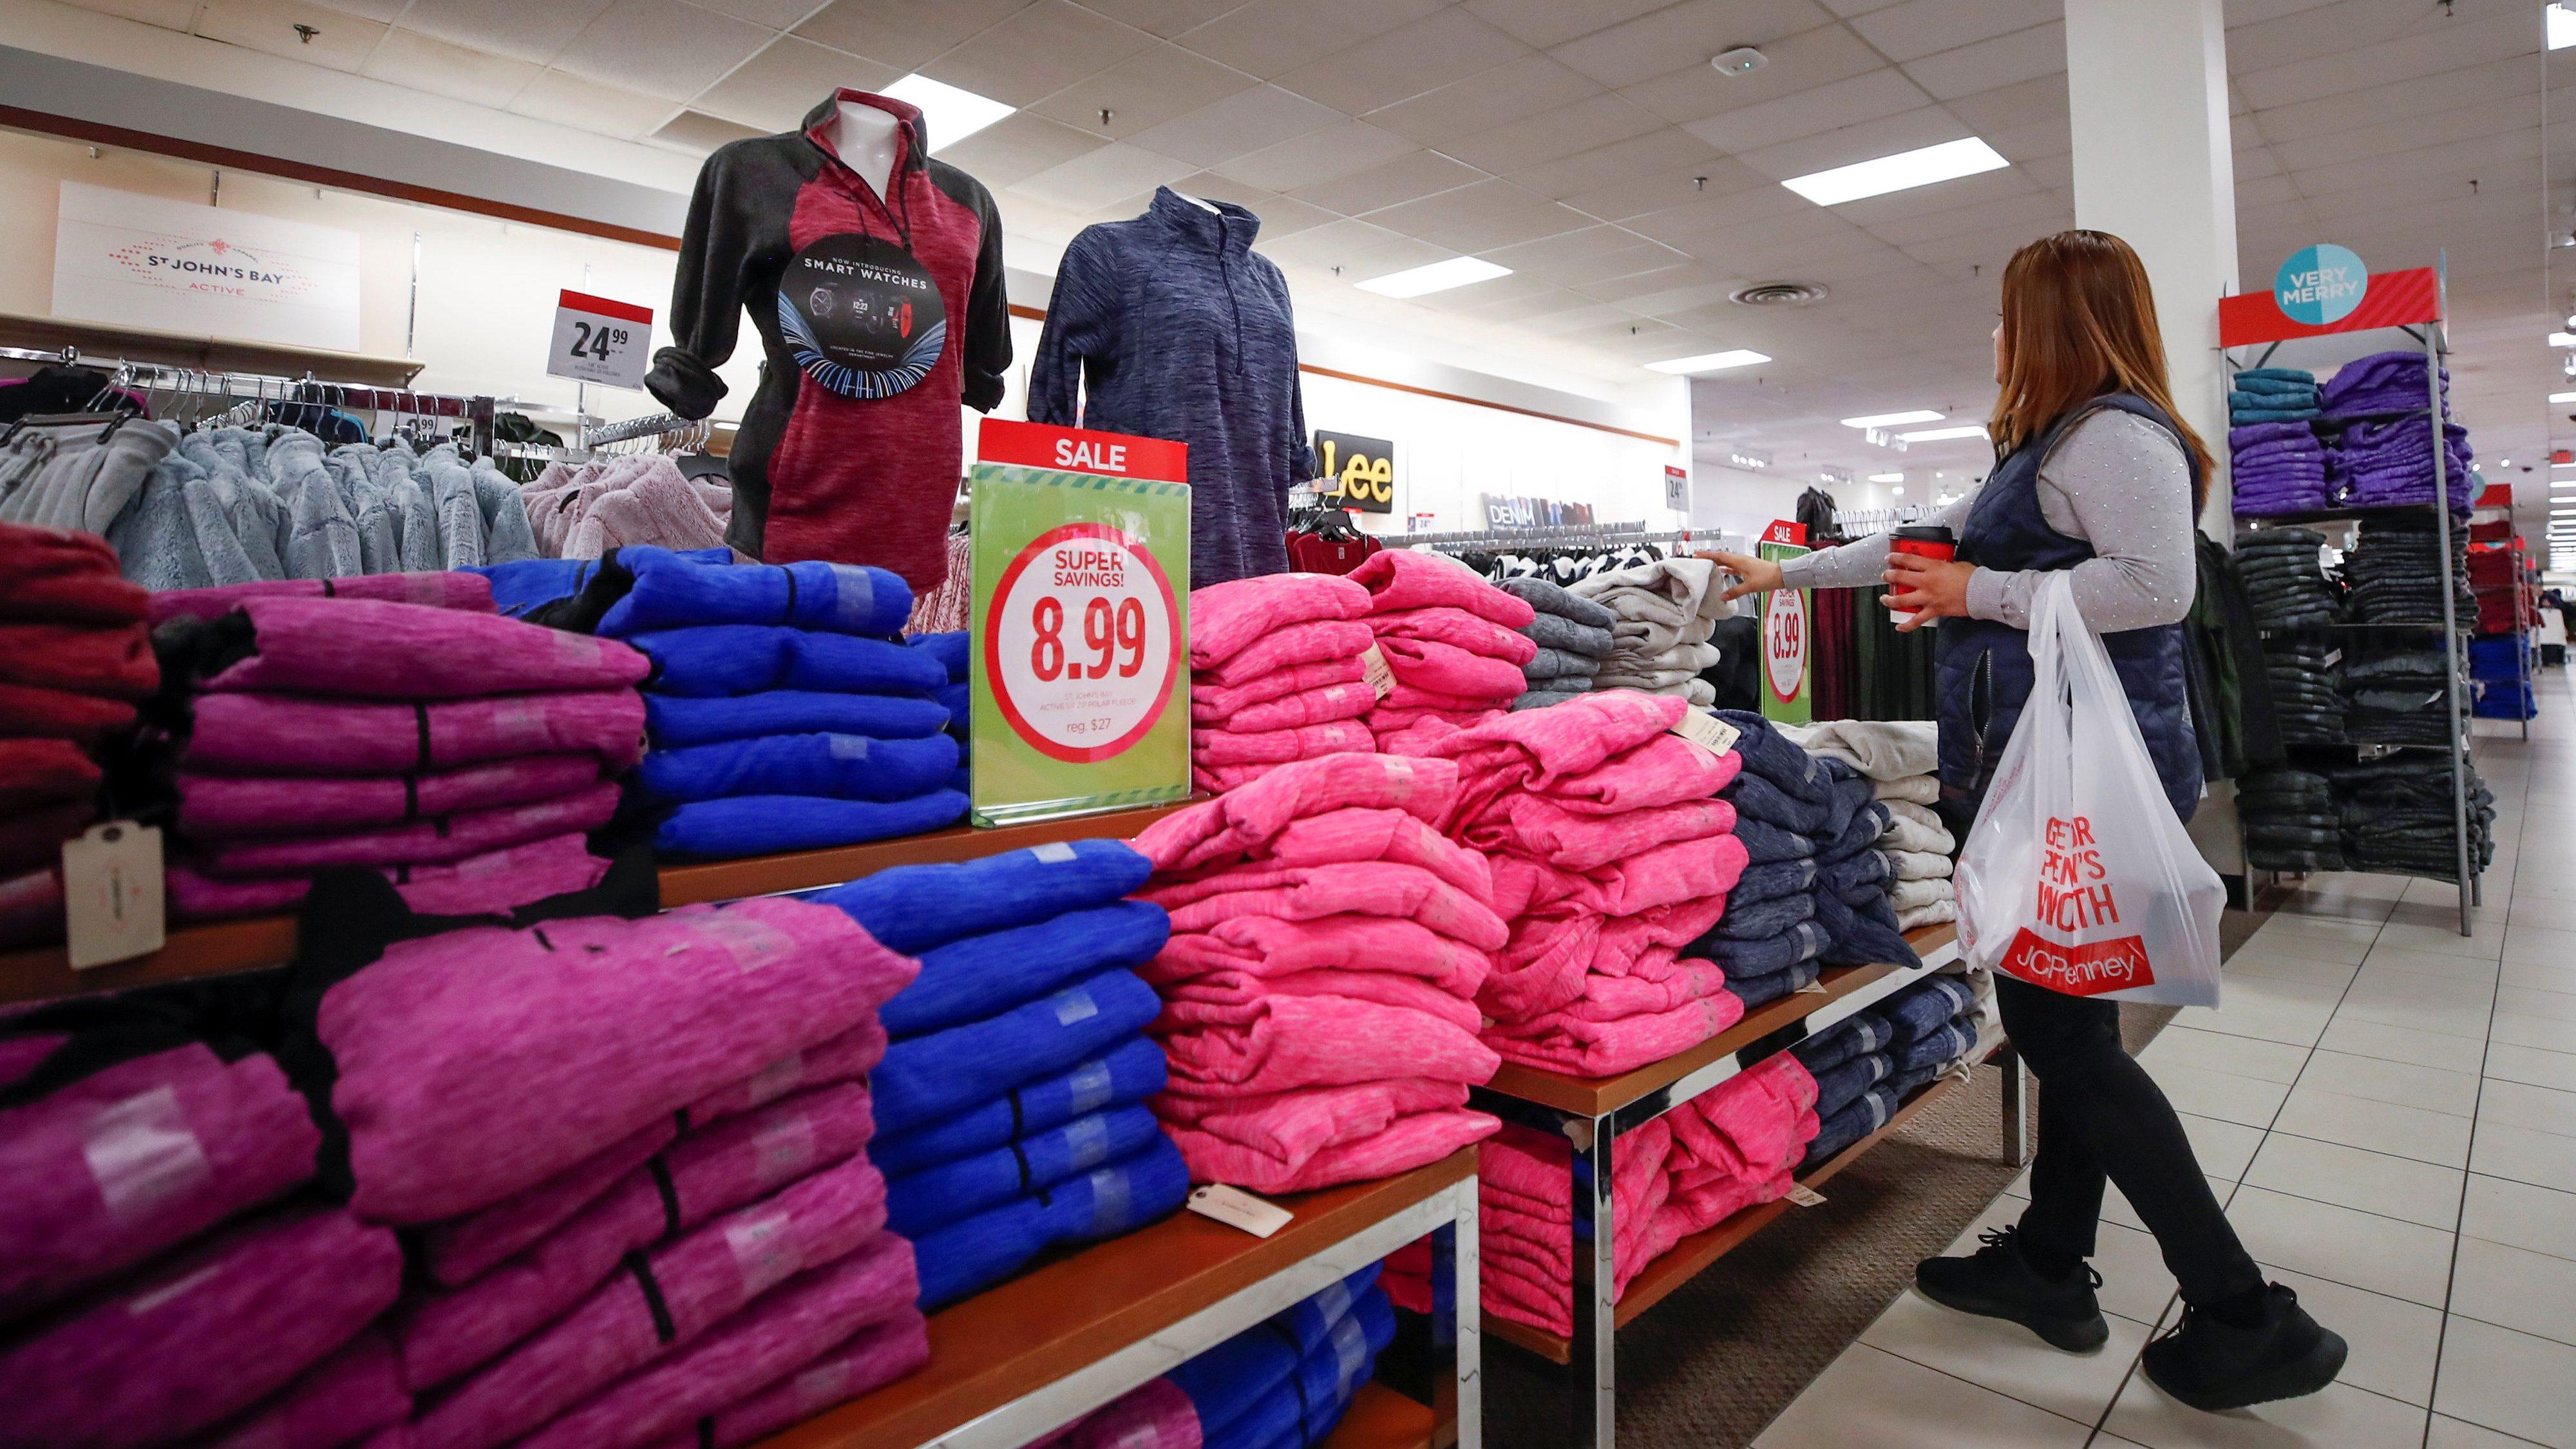 A shopper checks on merchandise at the J.C. Penney department store in North Riverside, Illinois, U.S., November 17, 2017. REUTERS/Kamil Krzaczynski - RC1ED0618480